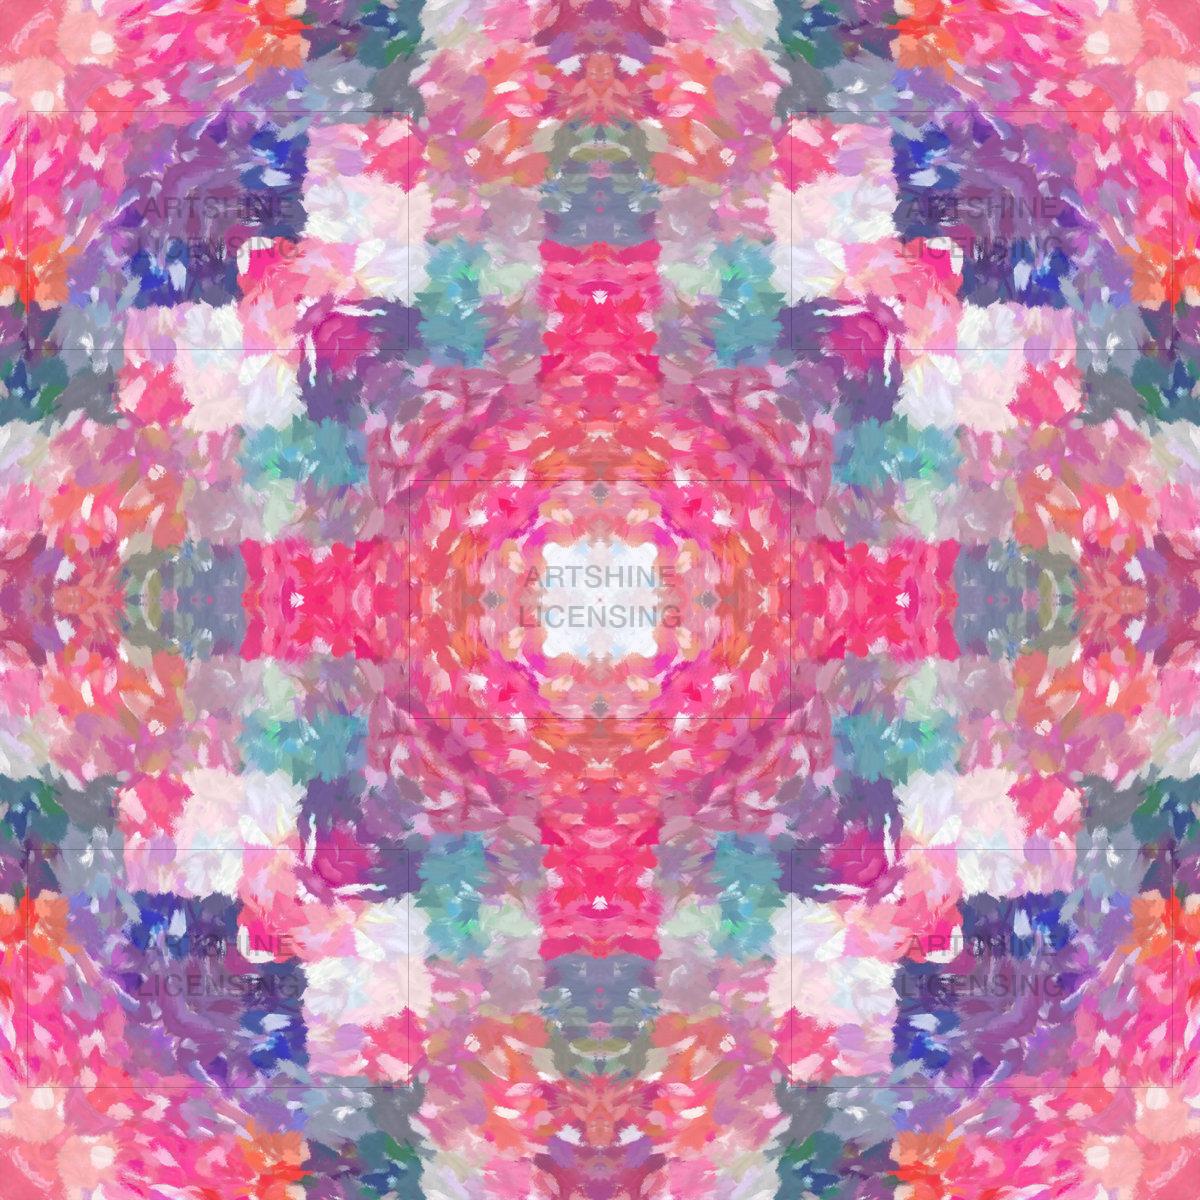 Candy Dreams - Part 2